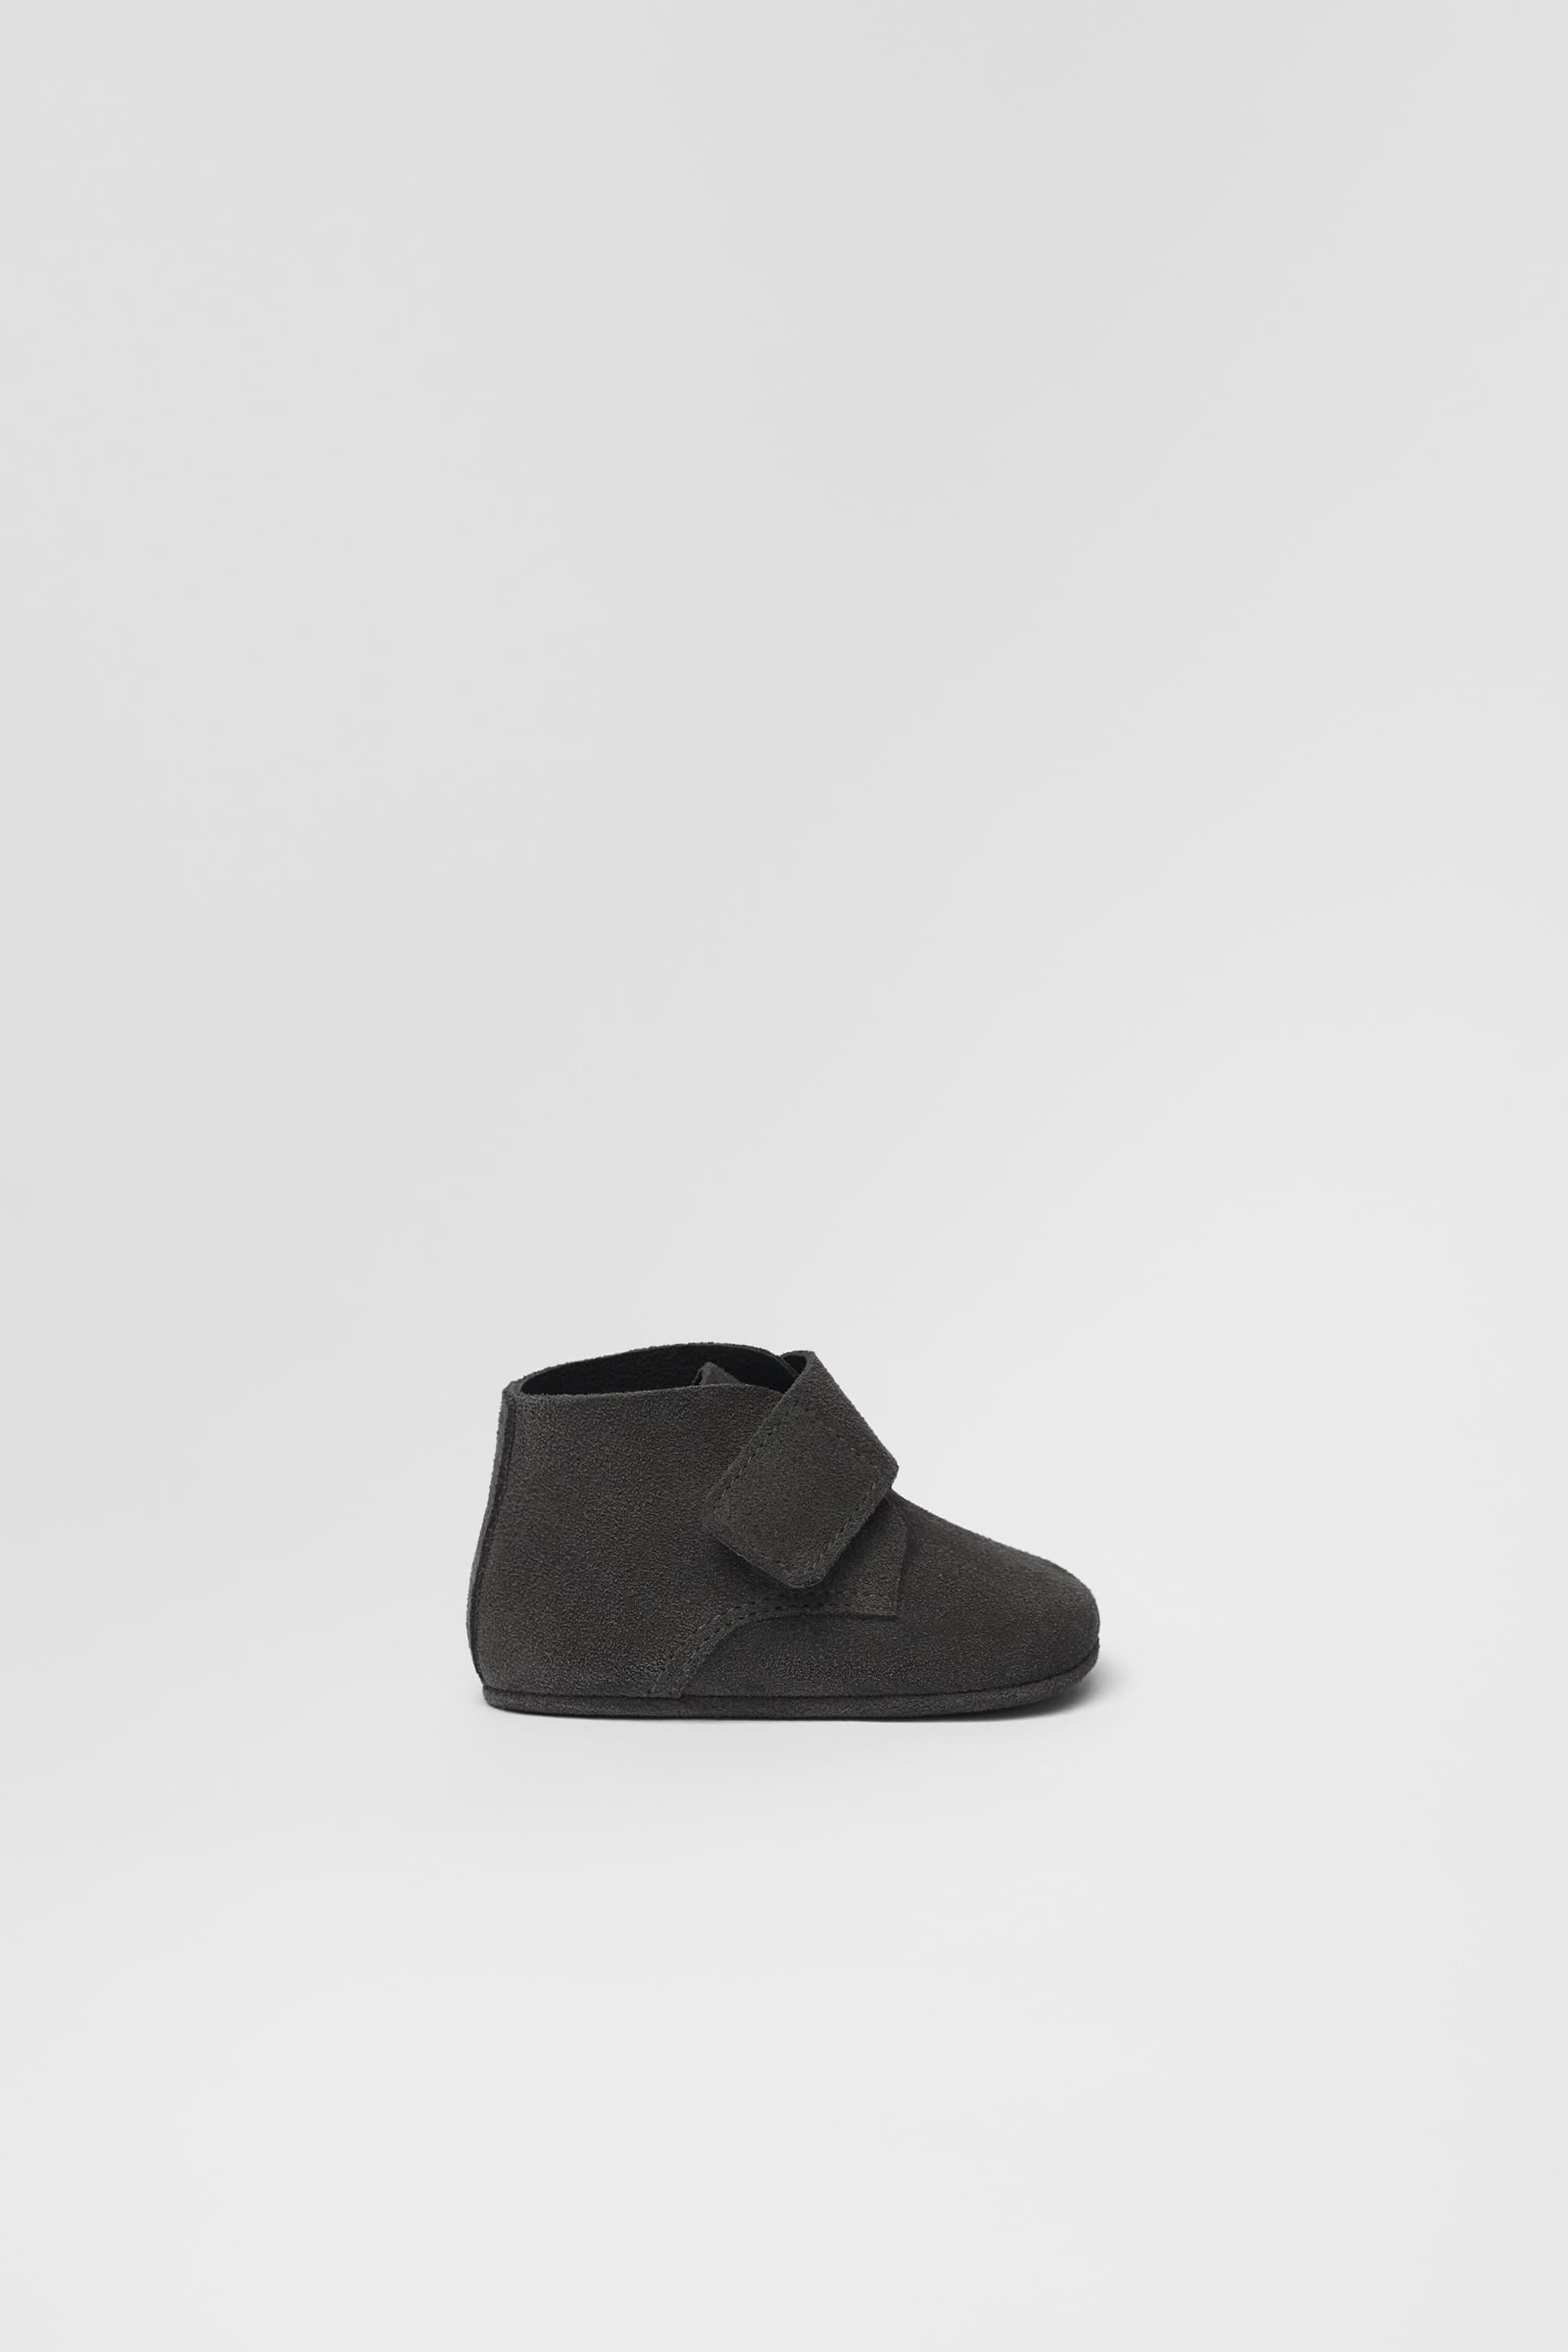 Zara BOOT STYLE BOOTIES